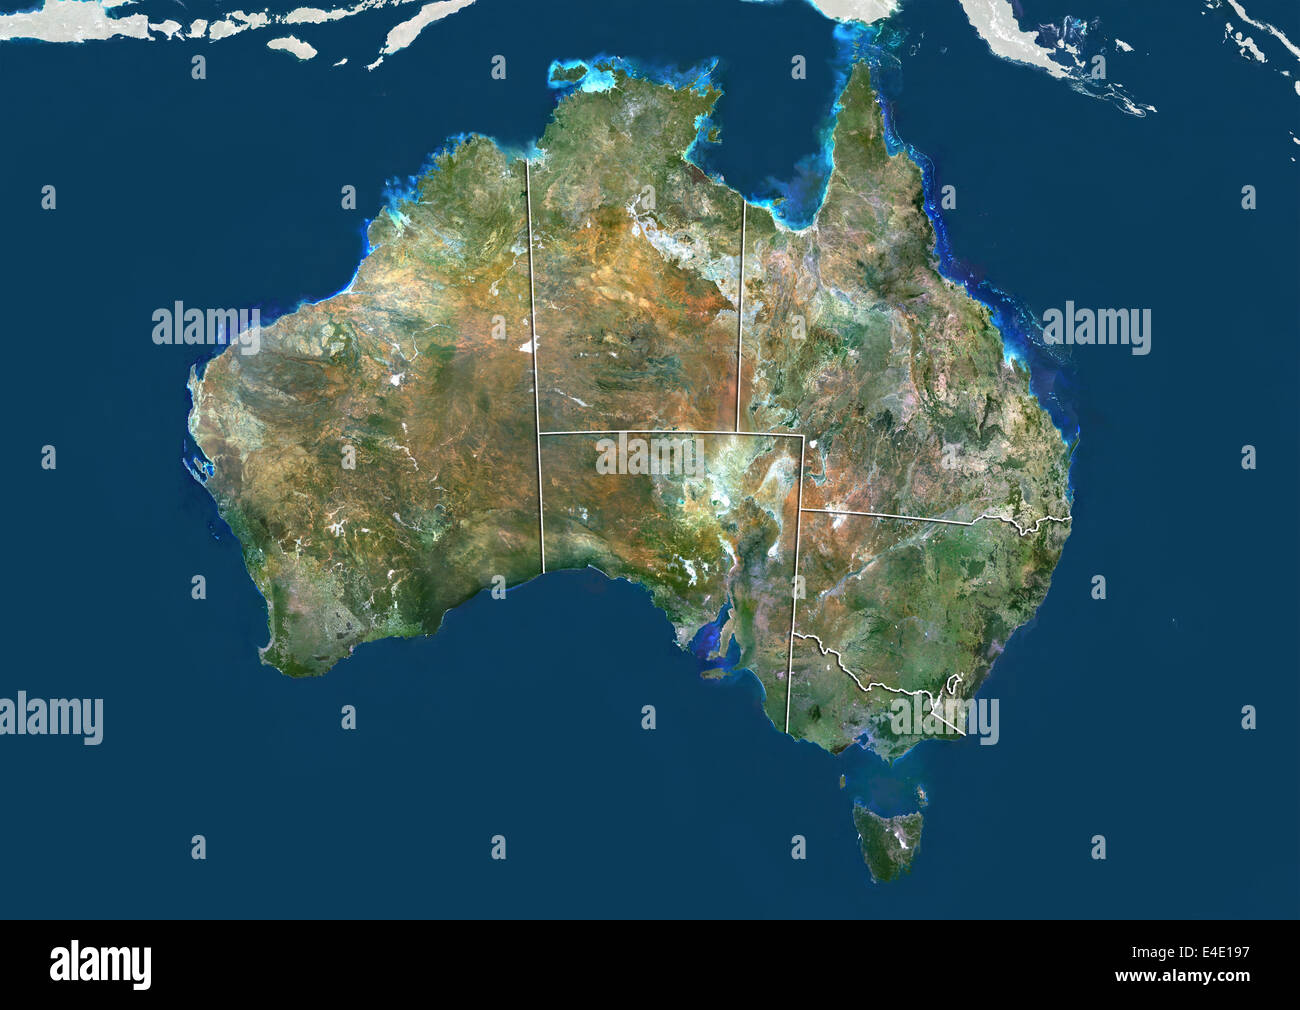 Map Of States Of Australia.Australia Map States Stock Photos Australia Map States Stock